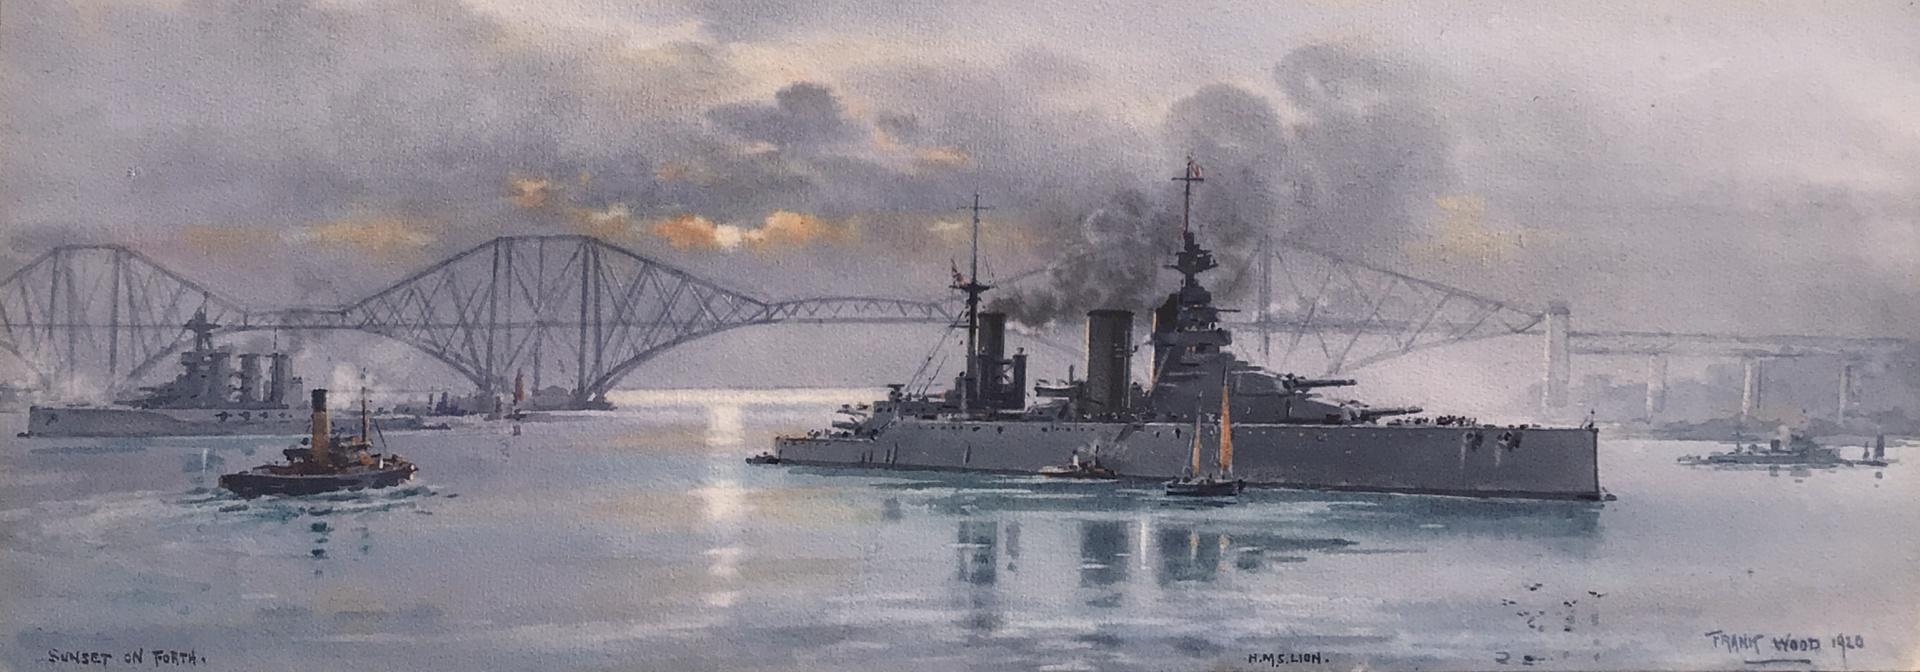 HMS LION lying below the Forth Bridge, 1920